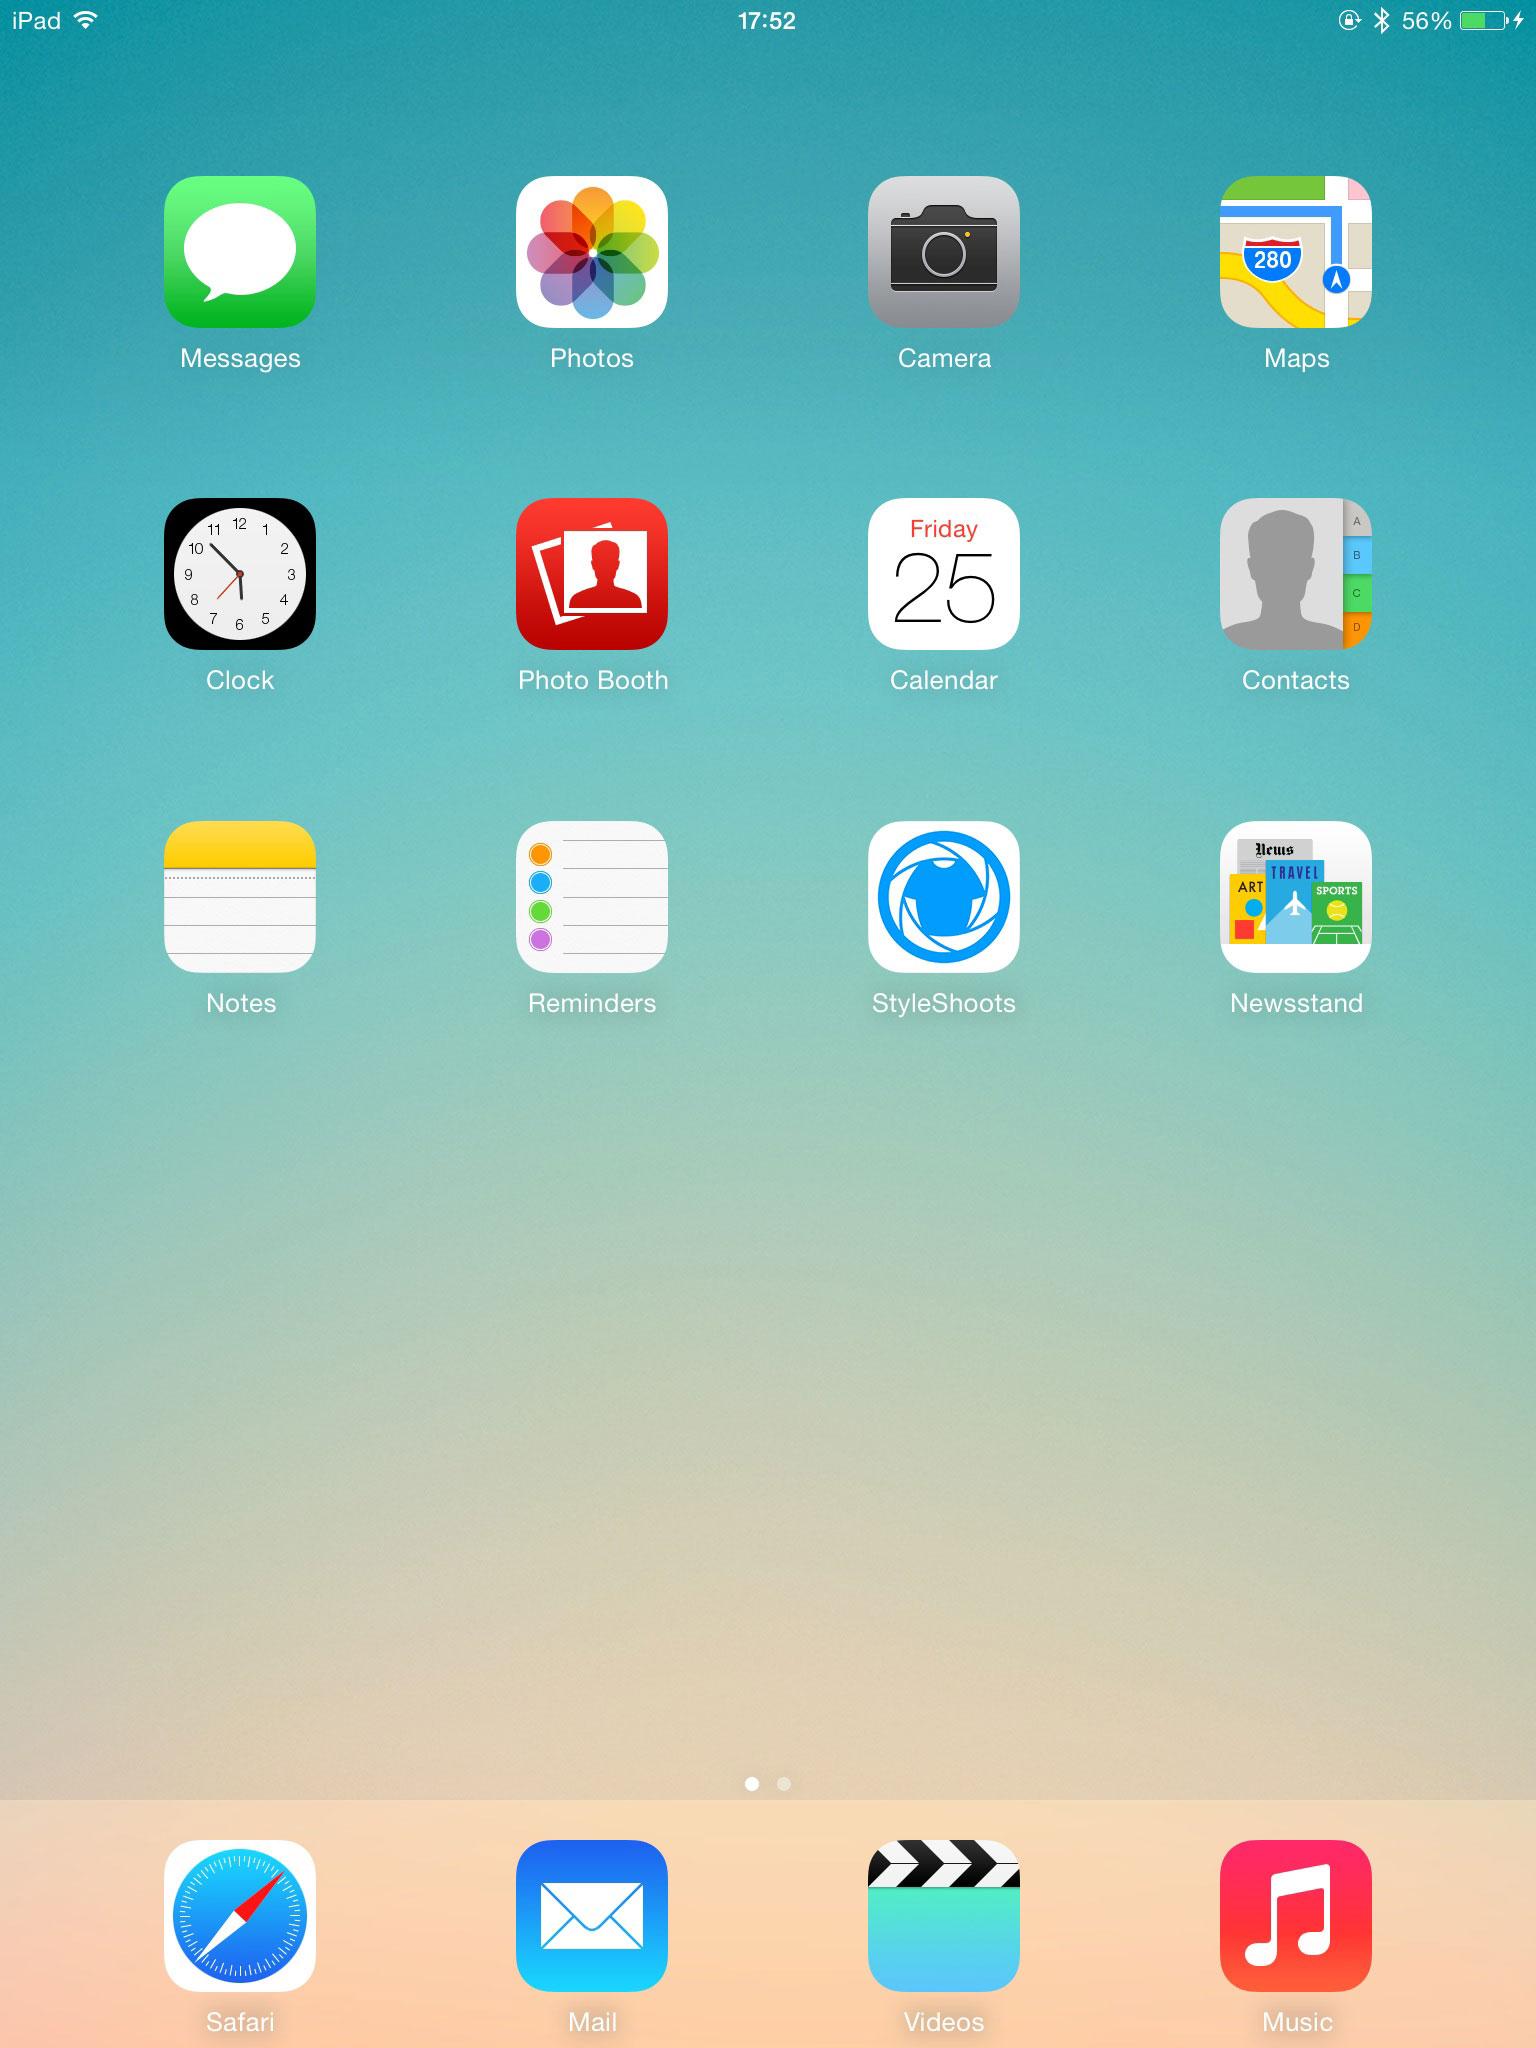 ipad-screen.jpg